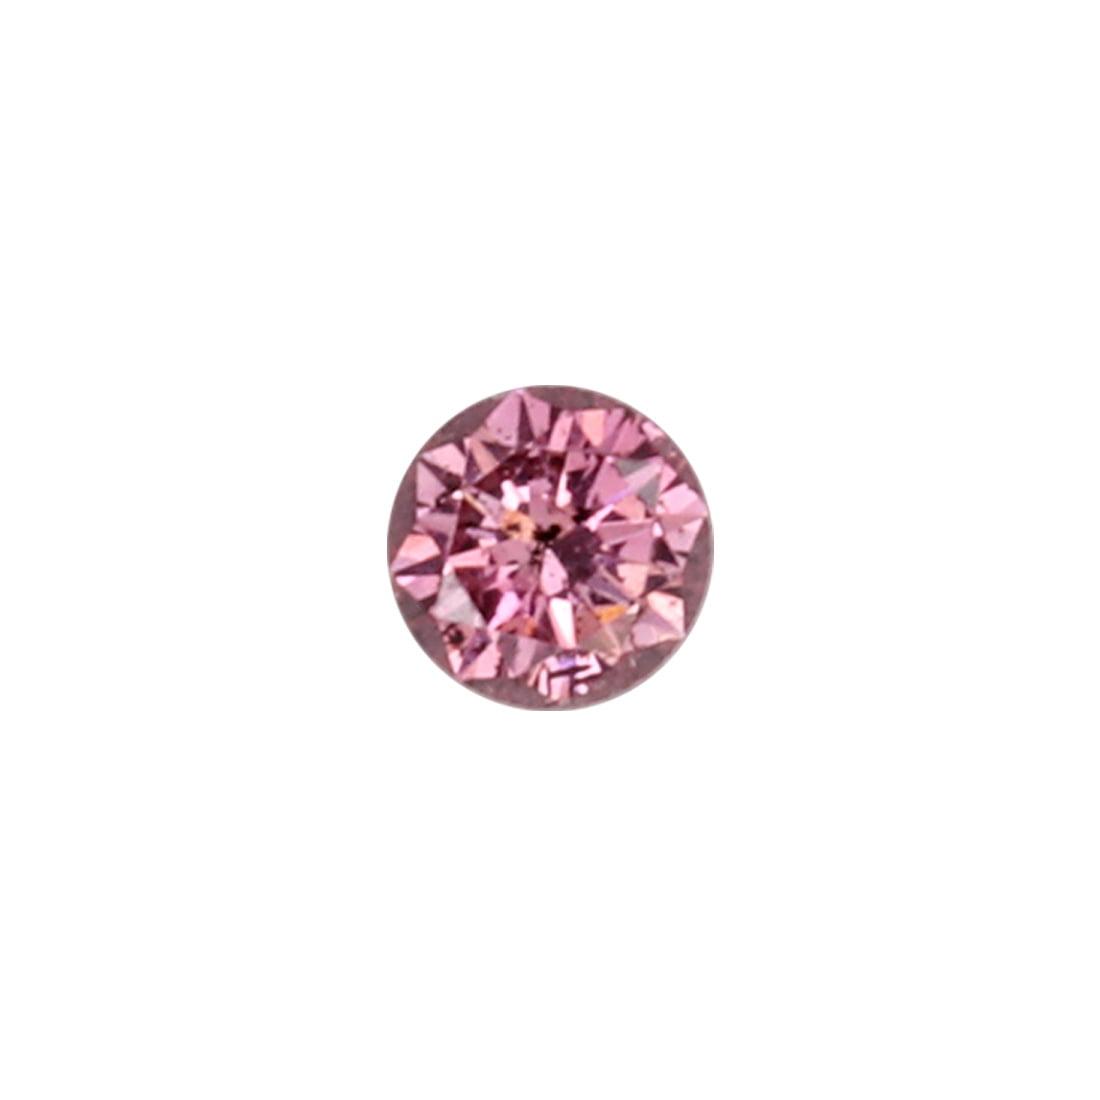 0.06ct Natural Fancy Deep Purplish Pink, 3PP Argyle Diamond